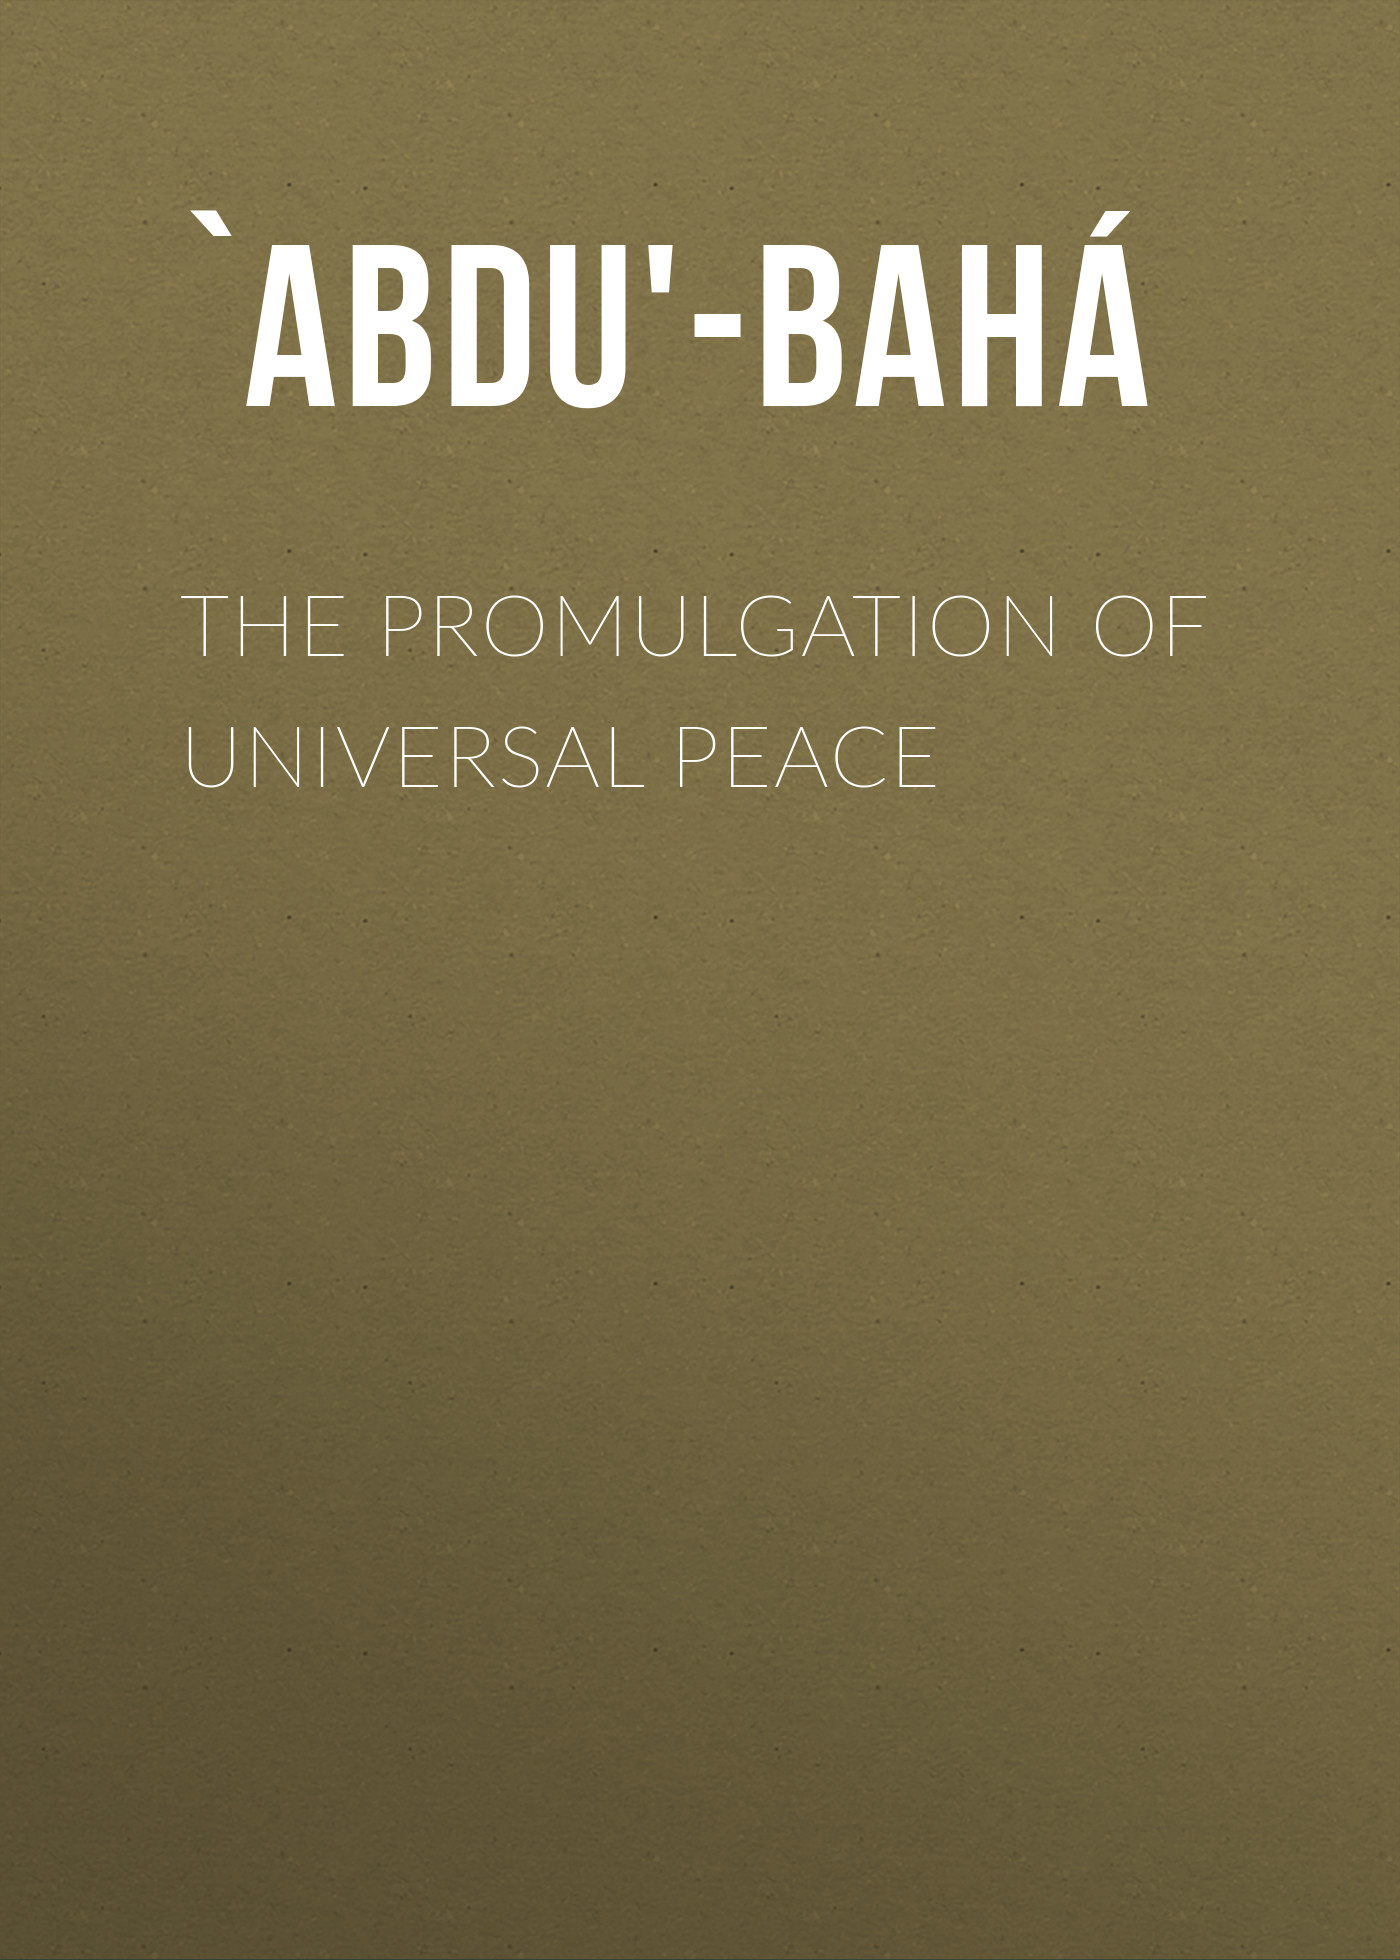 лучшая цена `Abdu'-Bahá The Promulgation of Universal Peace